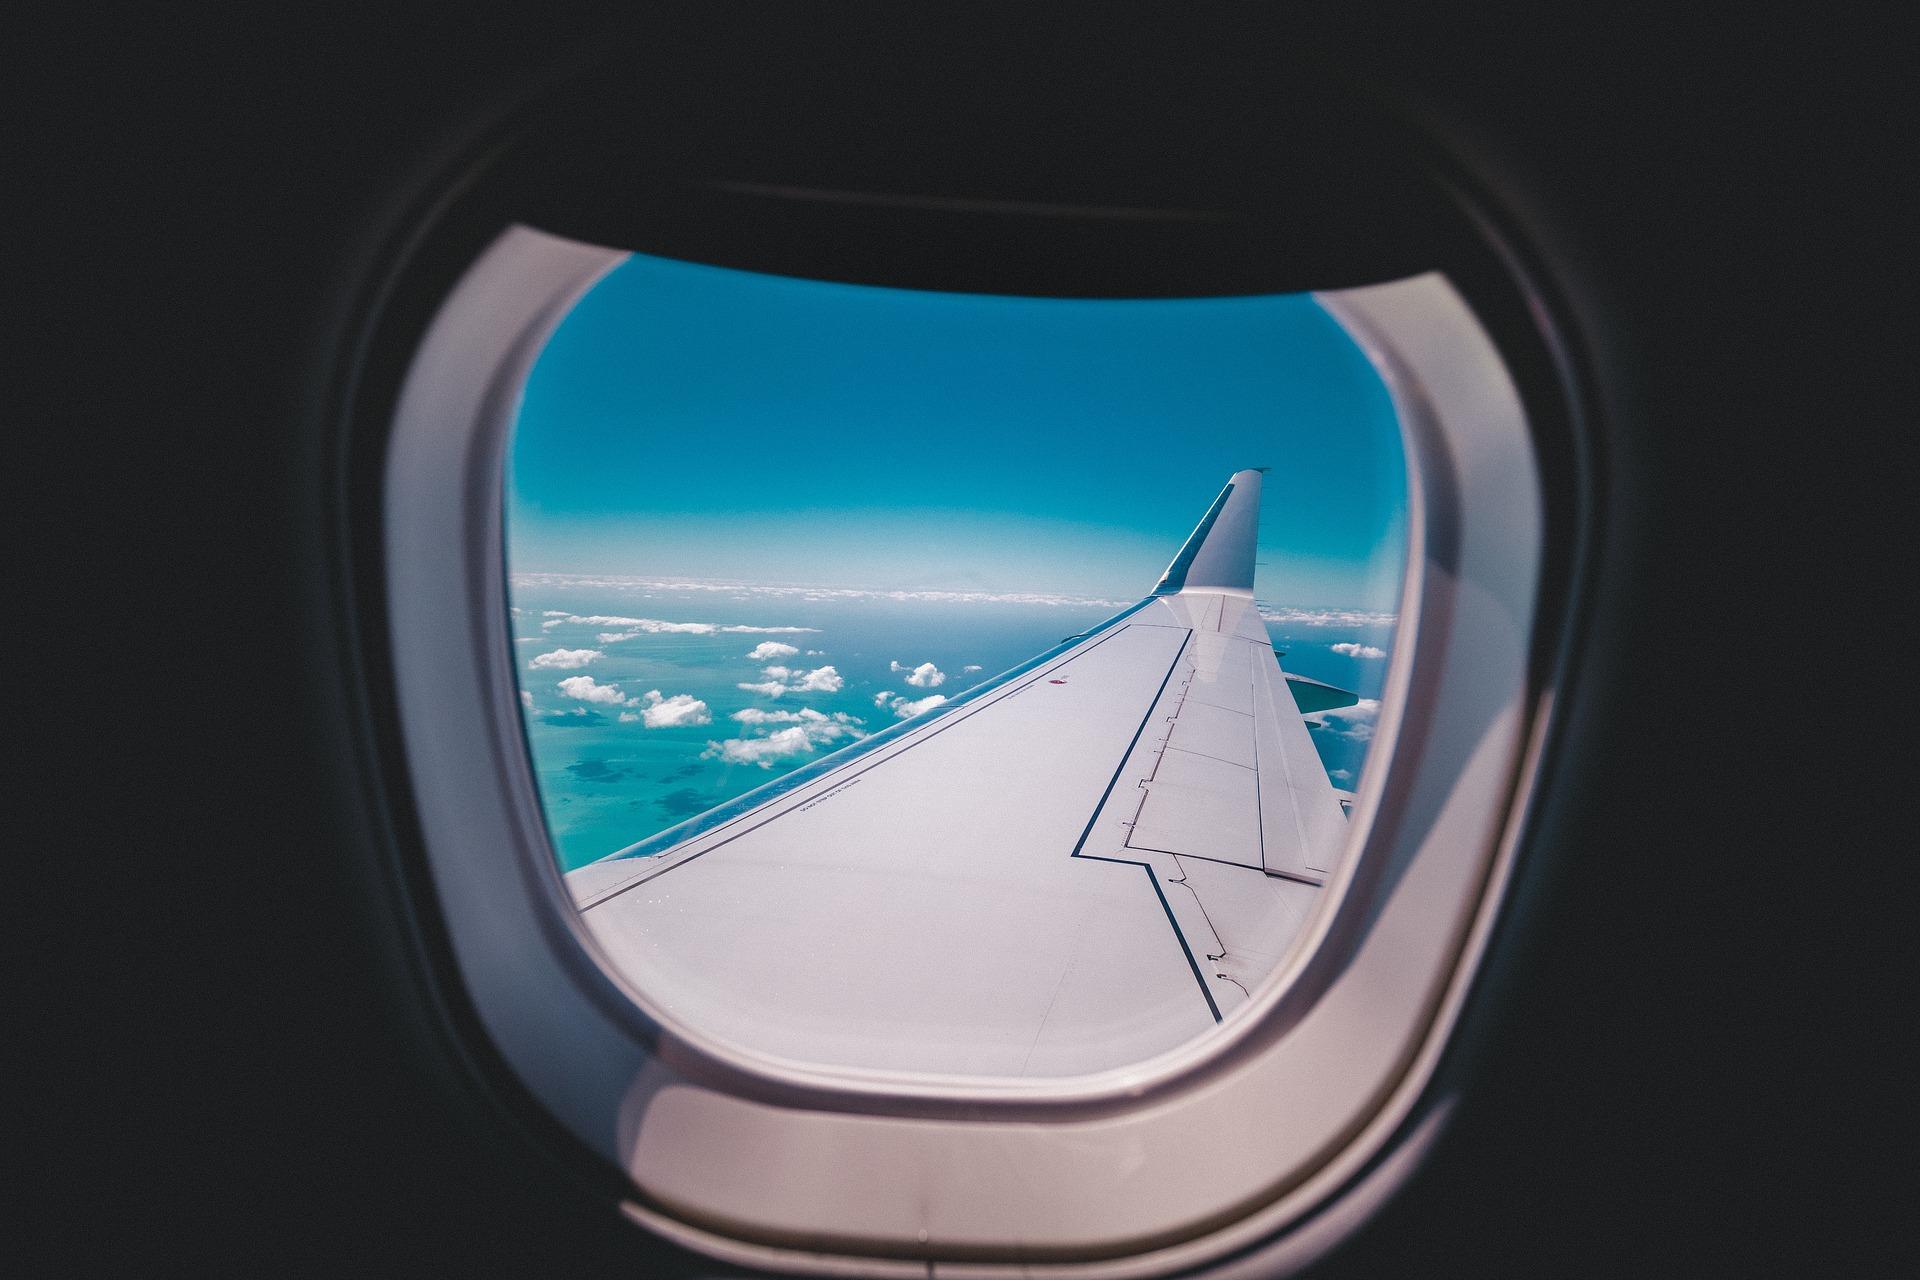 airplane-2588202_1920.jpg